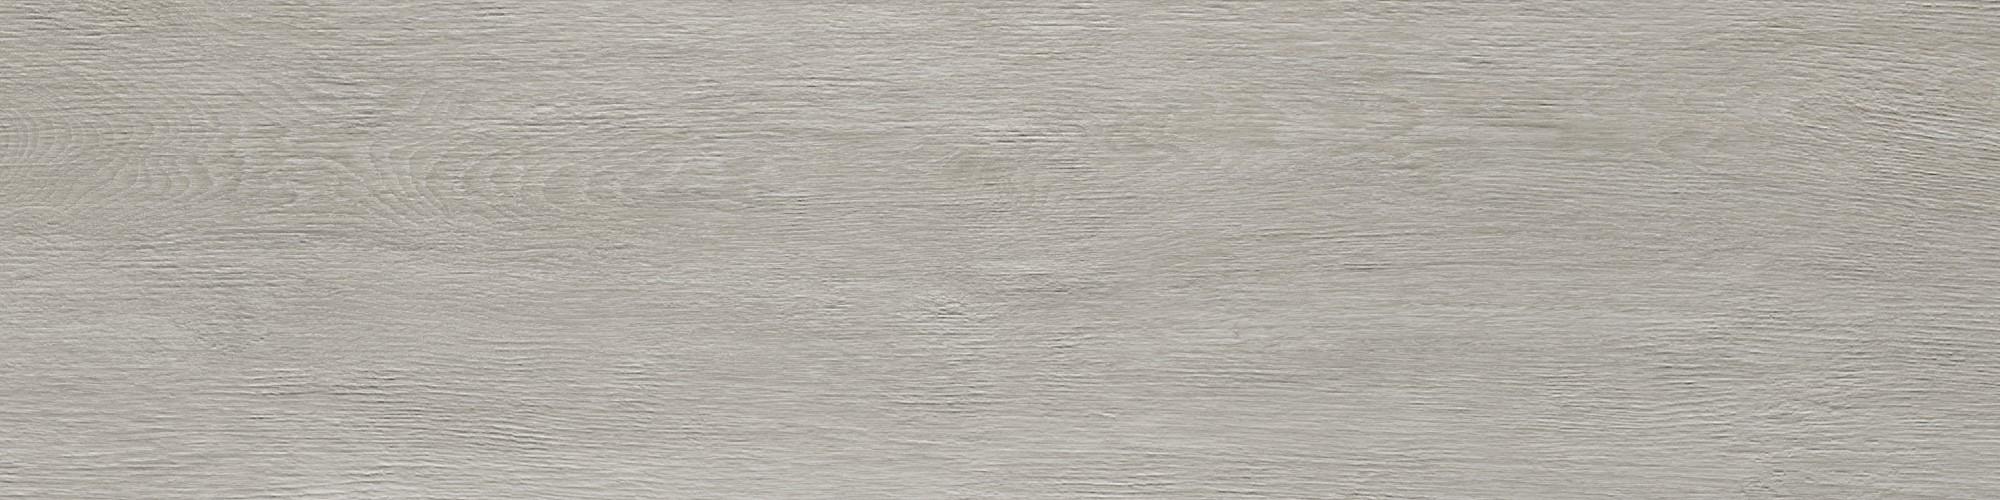 Abbey Base Grey 19,5x120